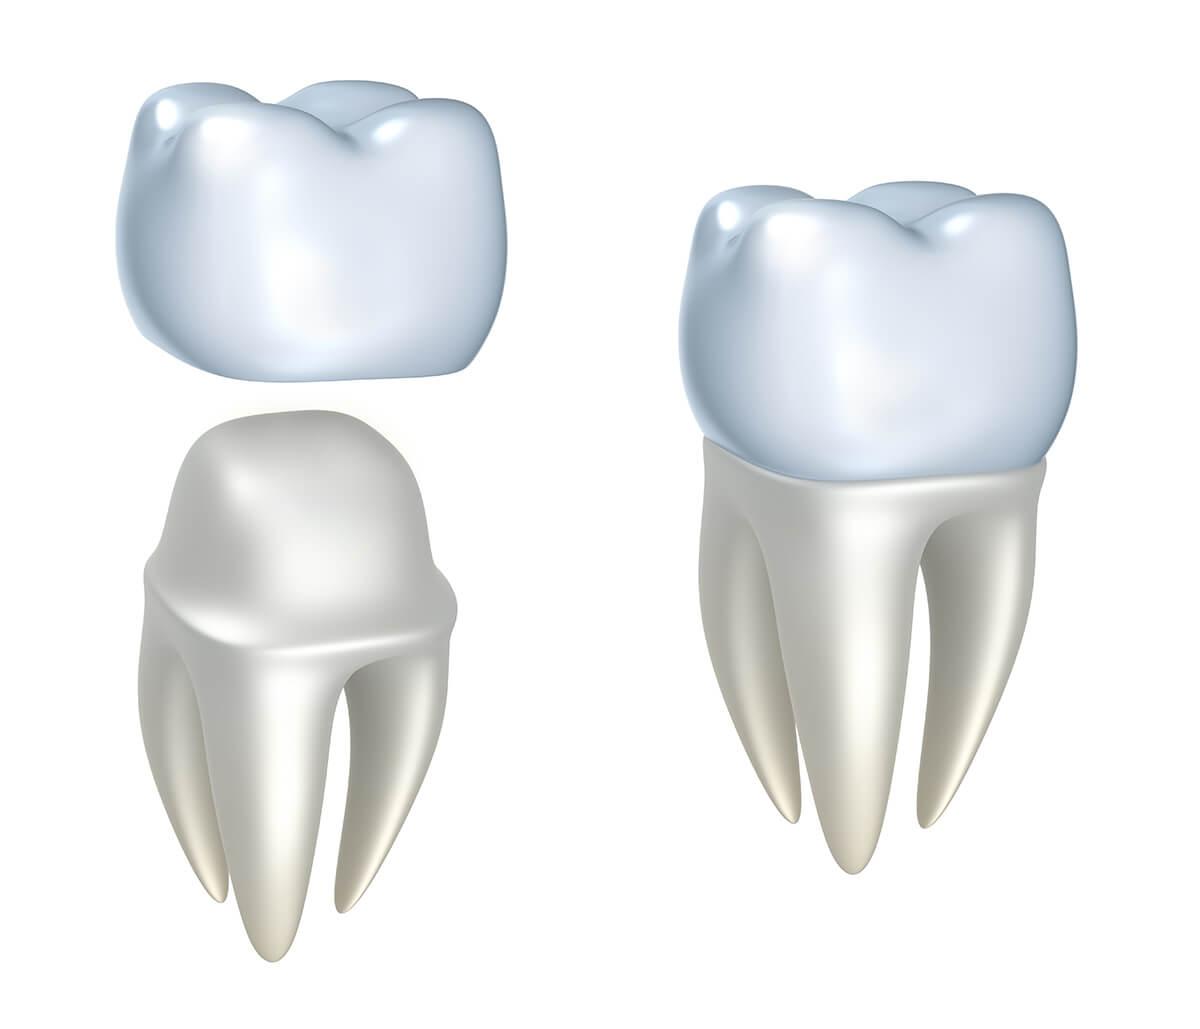 CEREC Crowns Dentist at Virtue Dental Care in Yadkinville NC Area